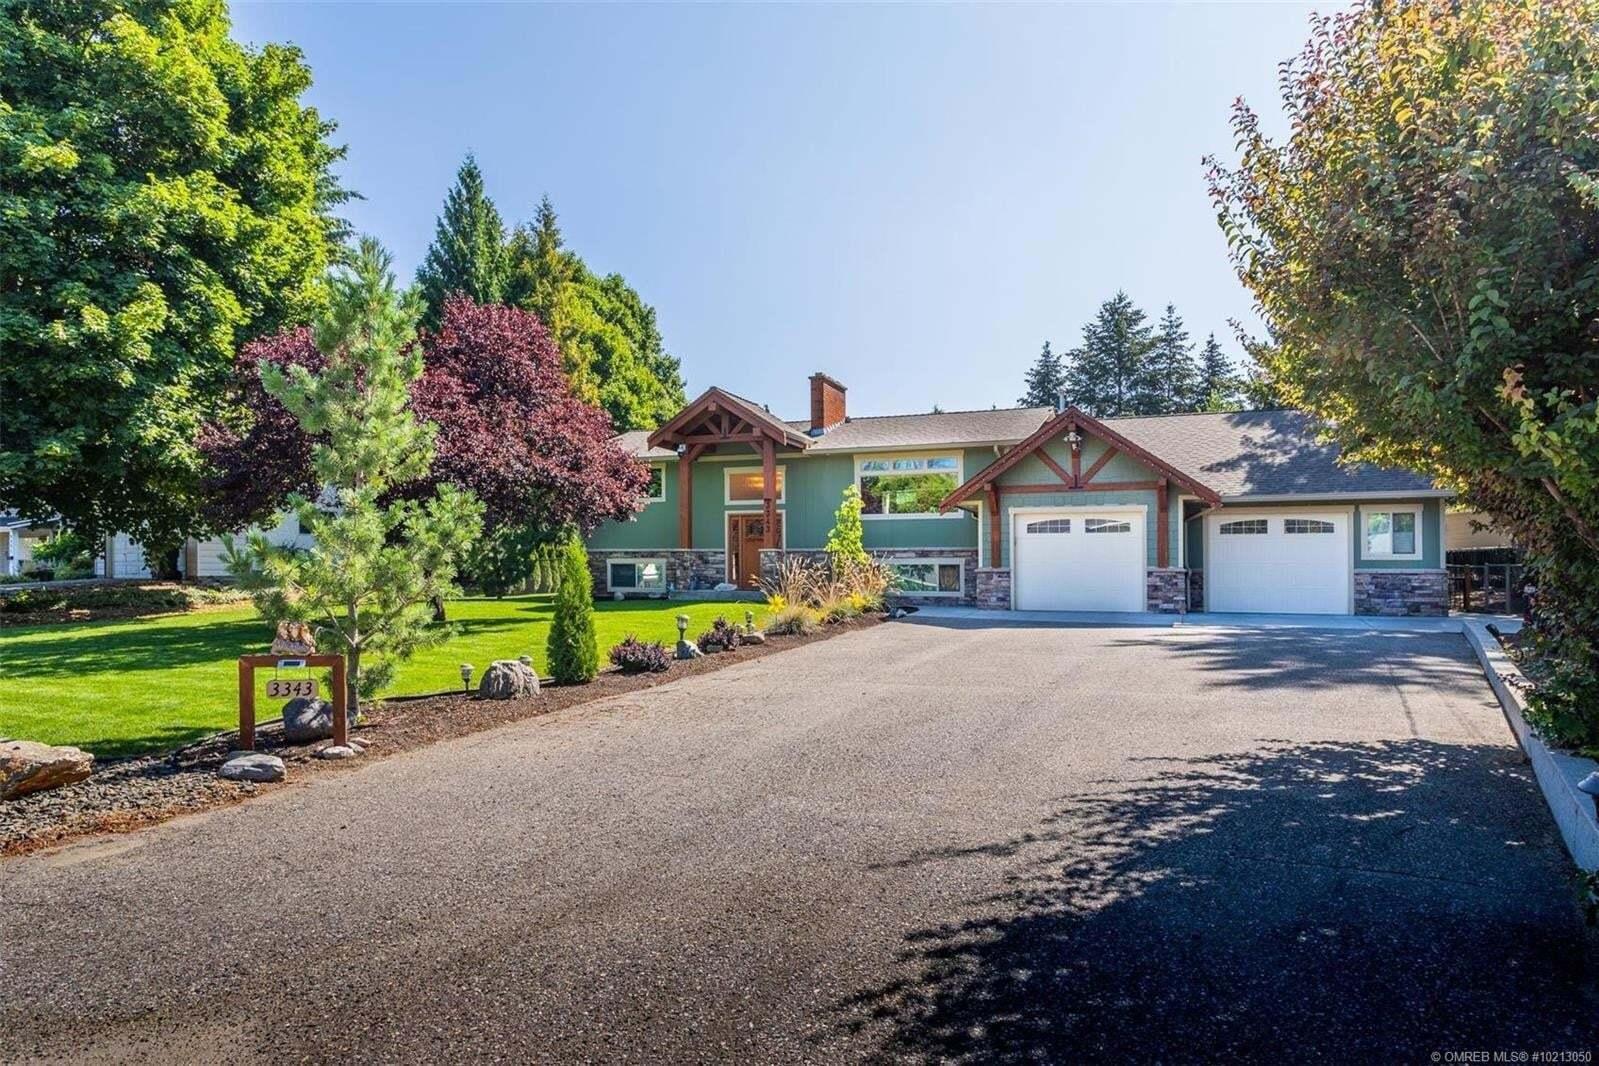 House for sale at 3343 Wildwood Rd Kelowna British Columbia - MLS: 10213050